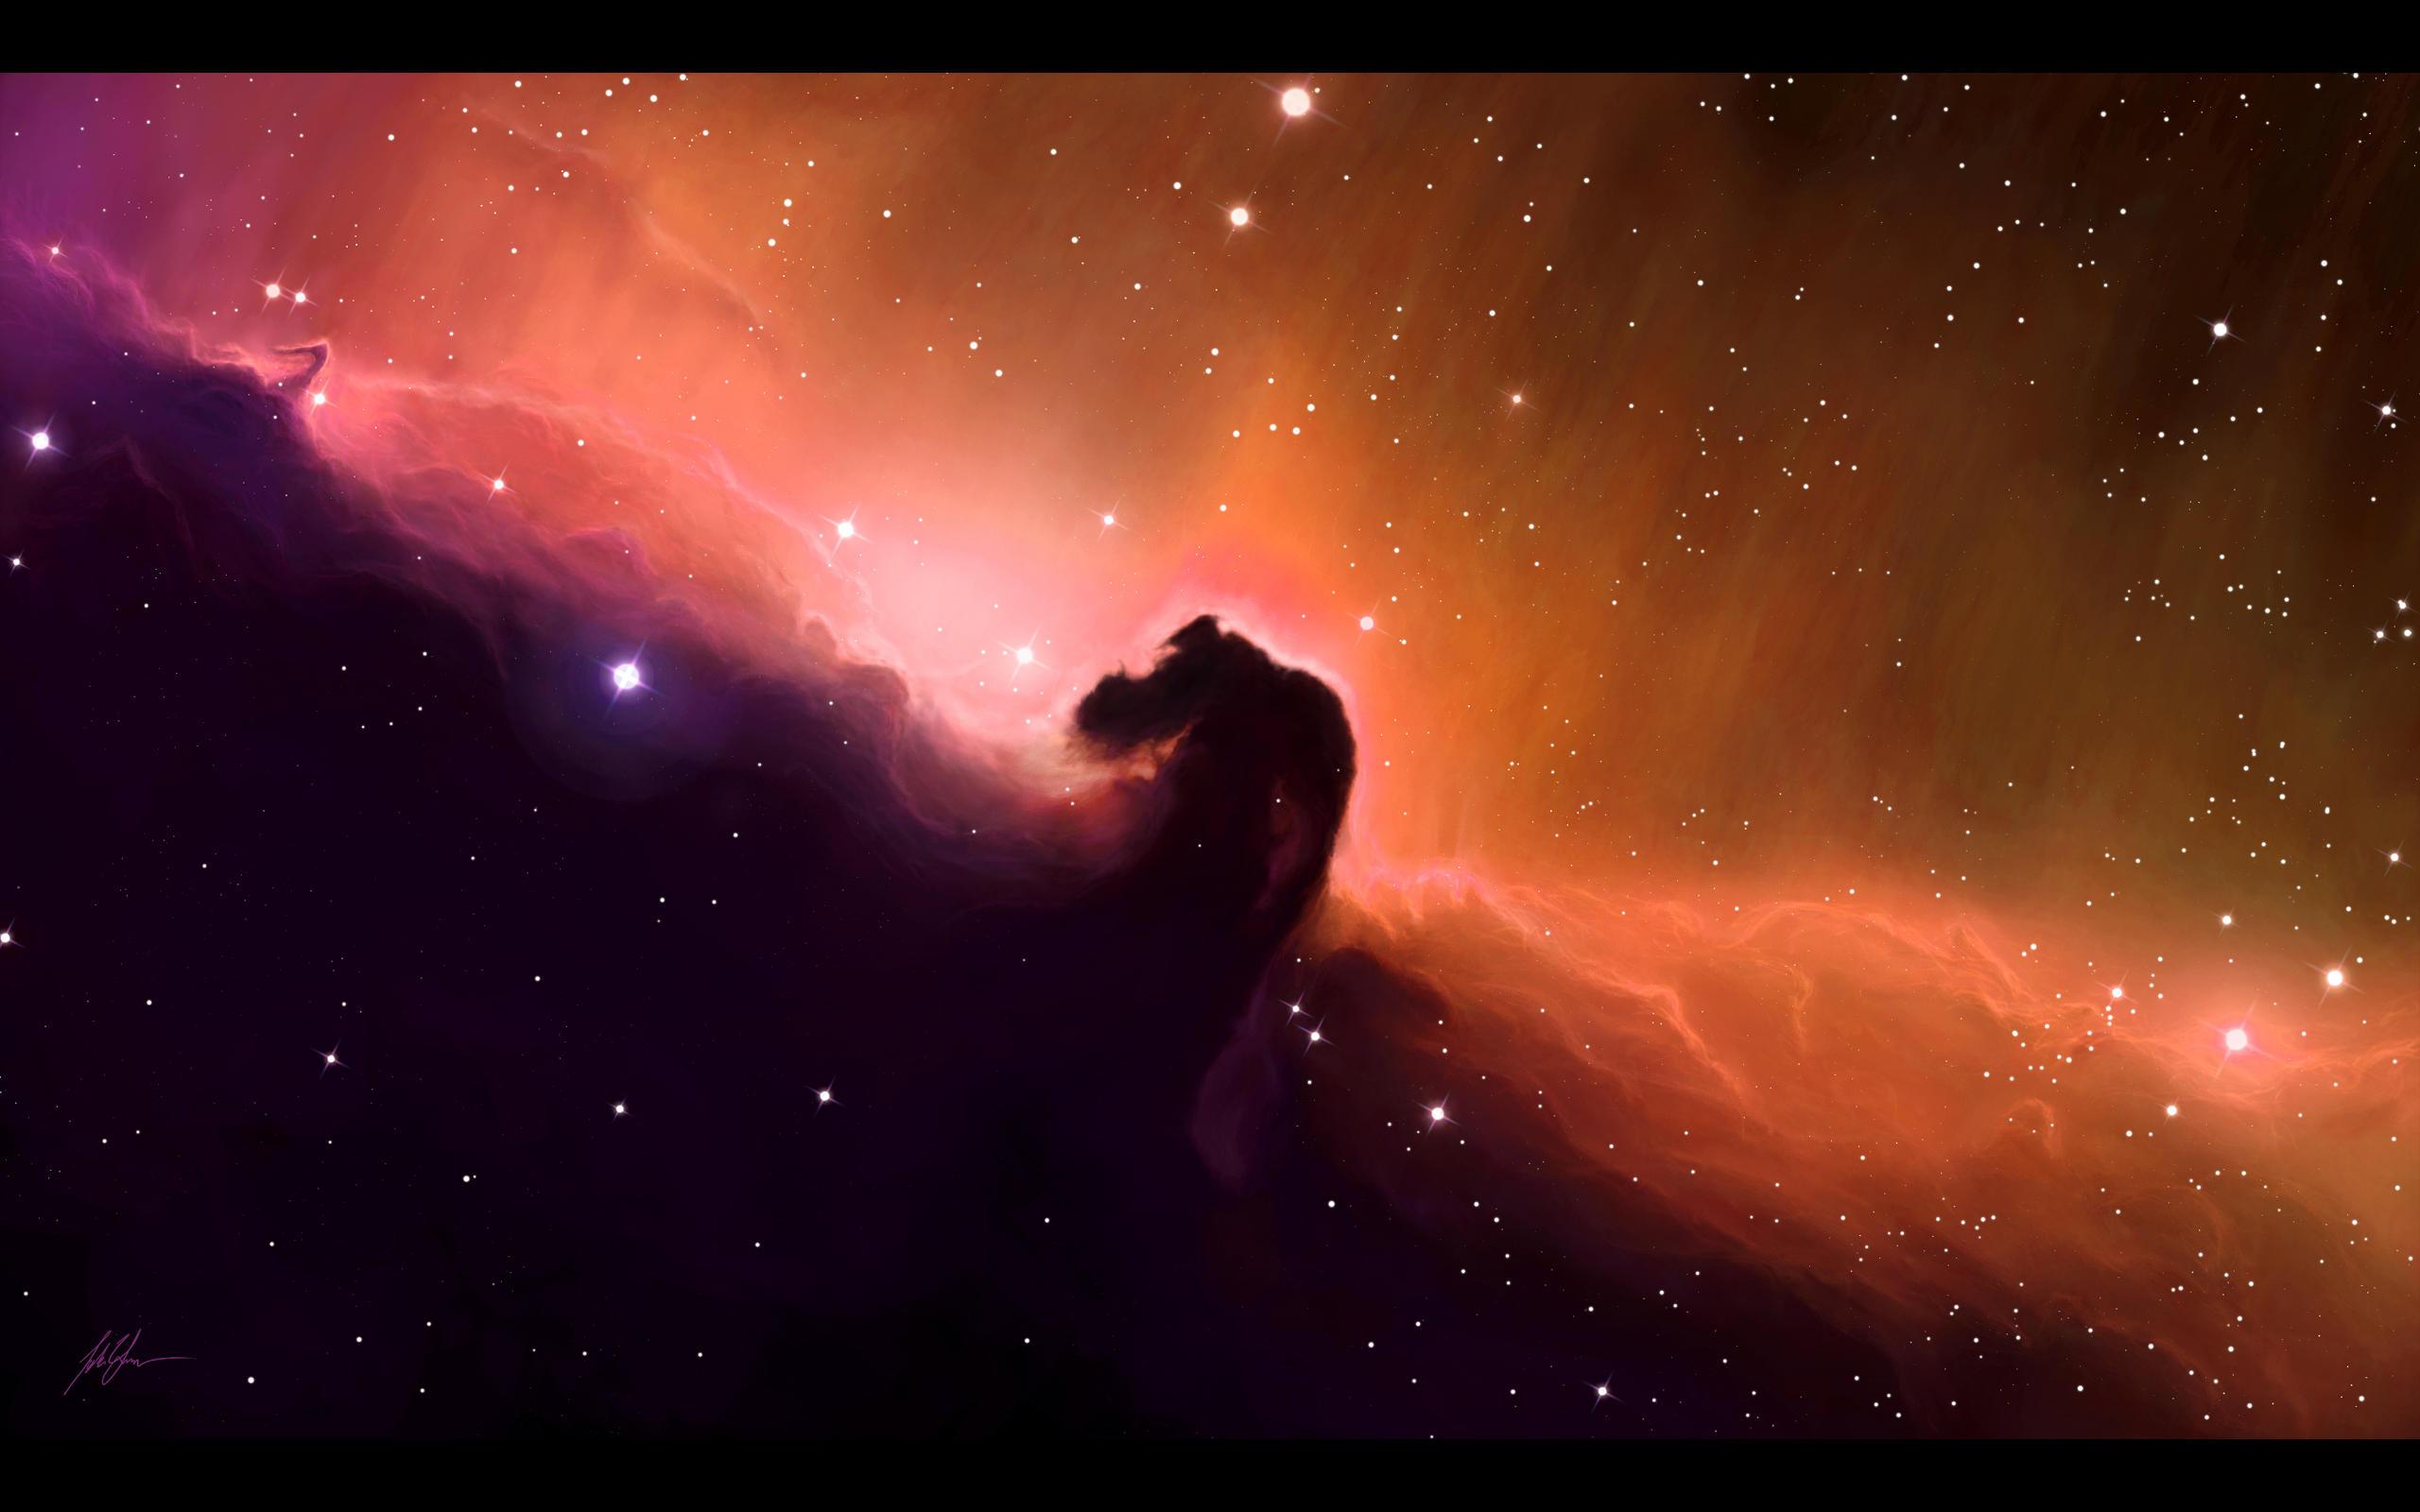 nebula wallpaper nasa